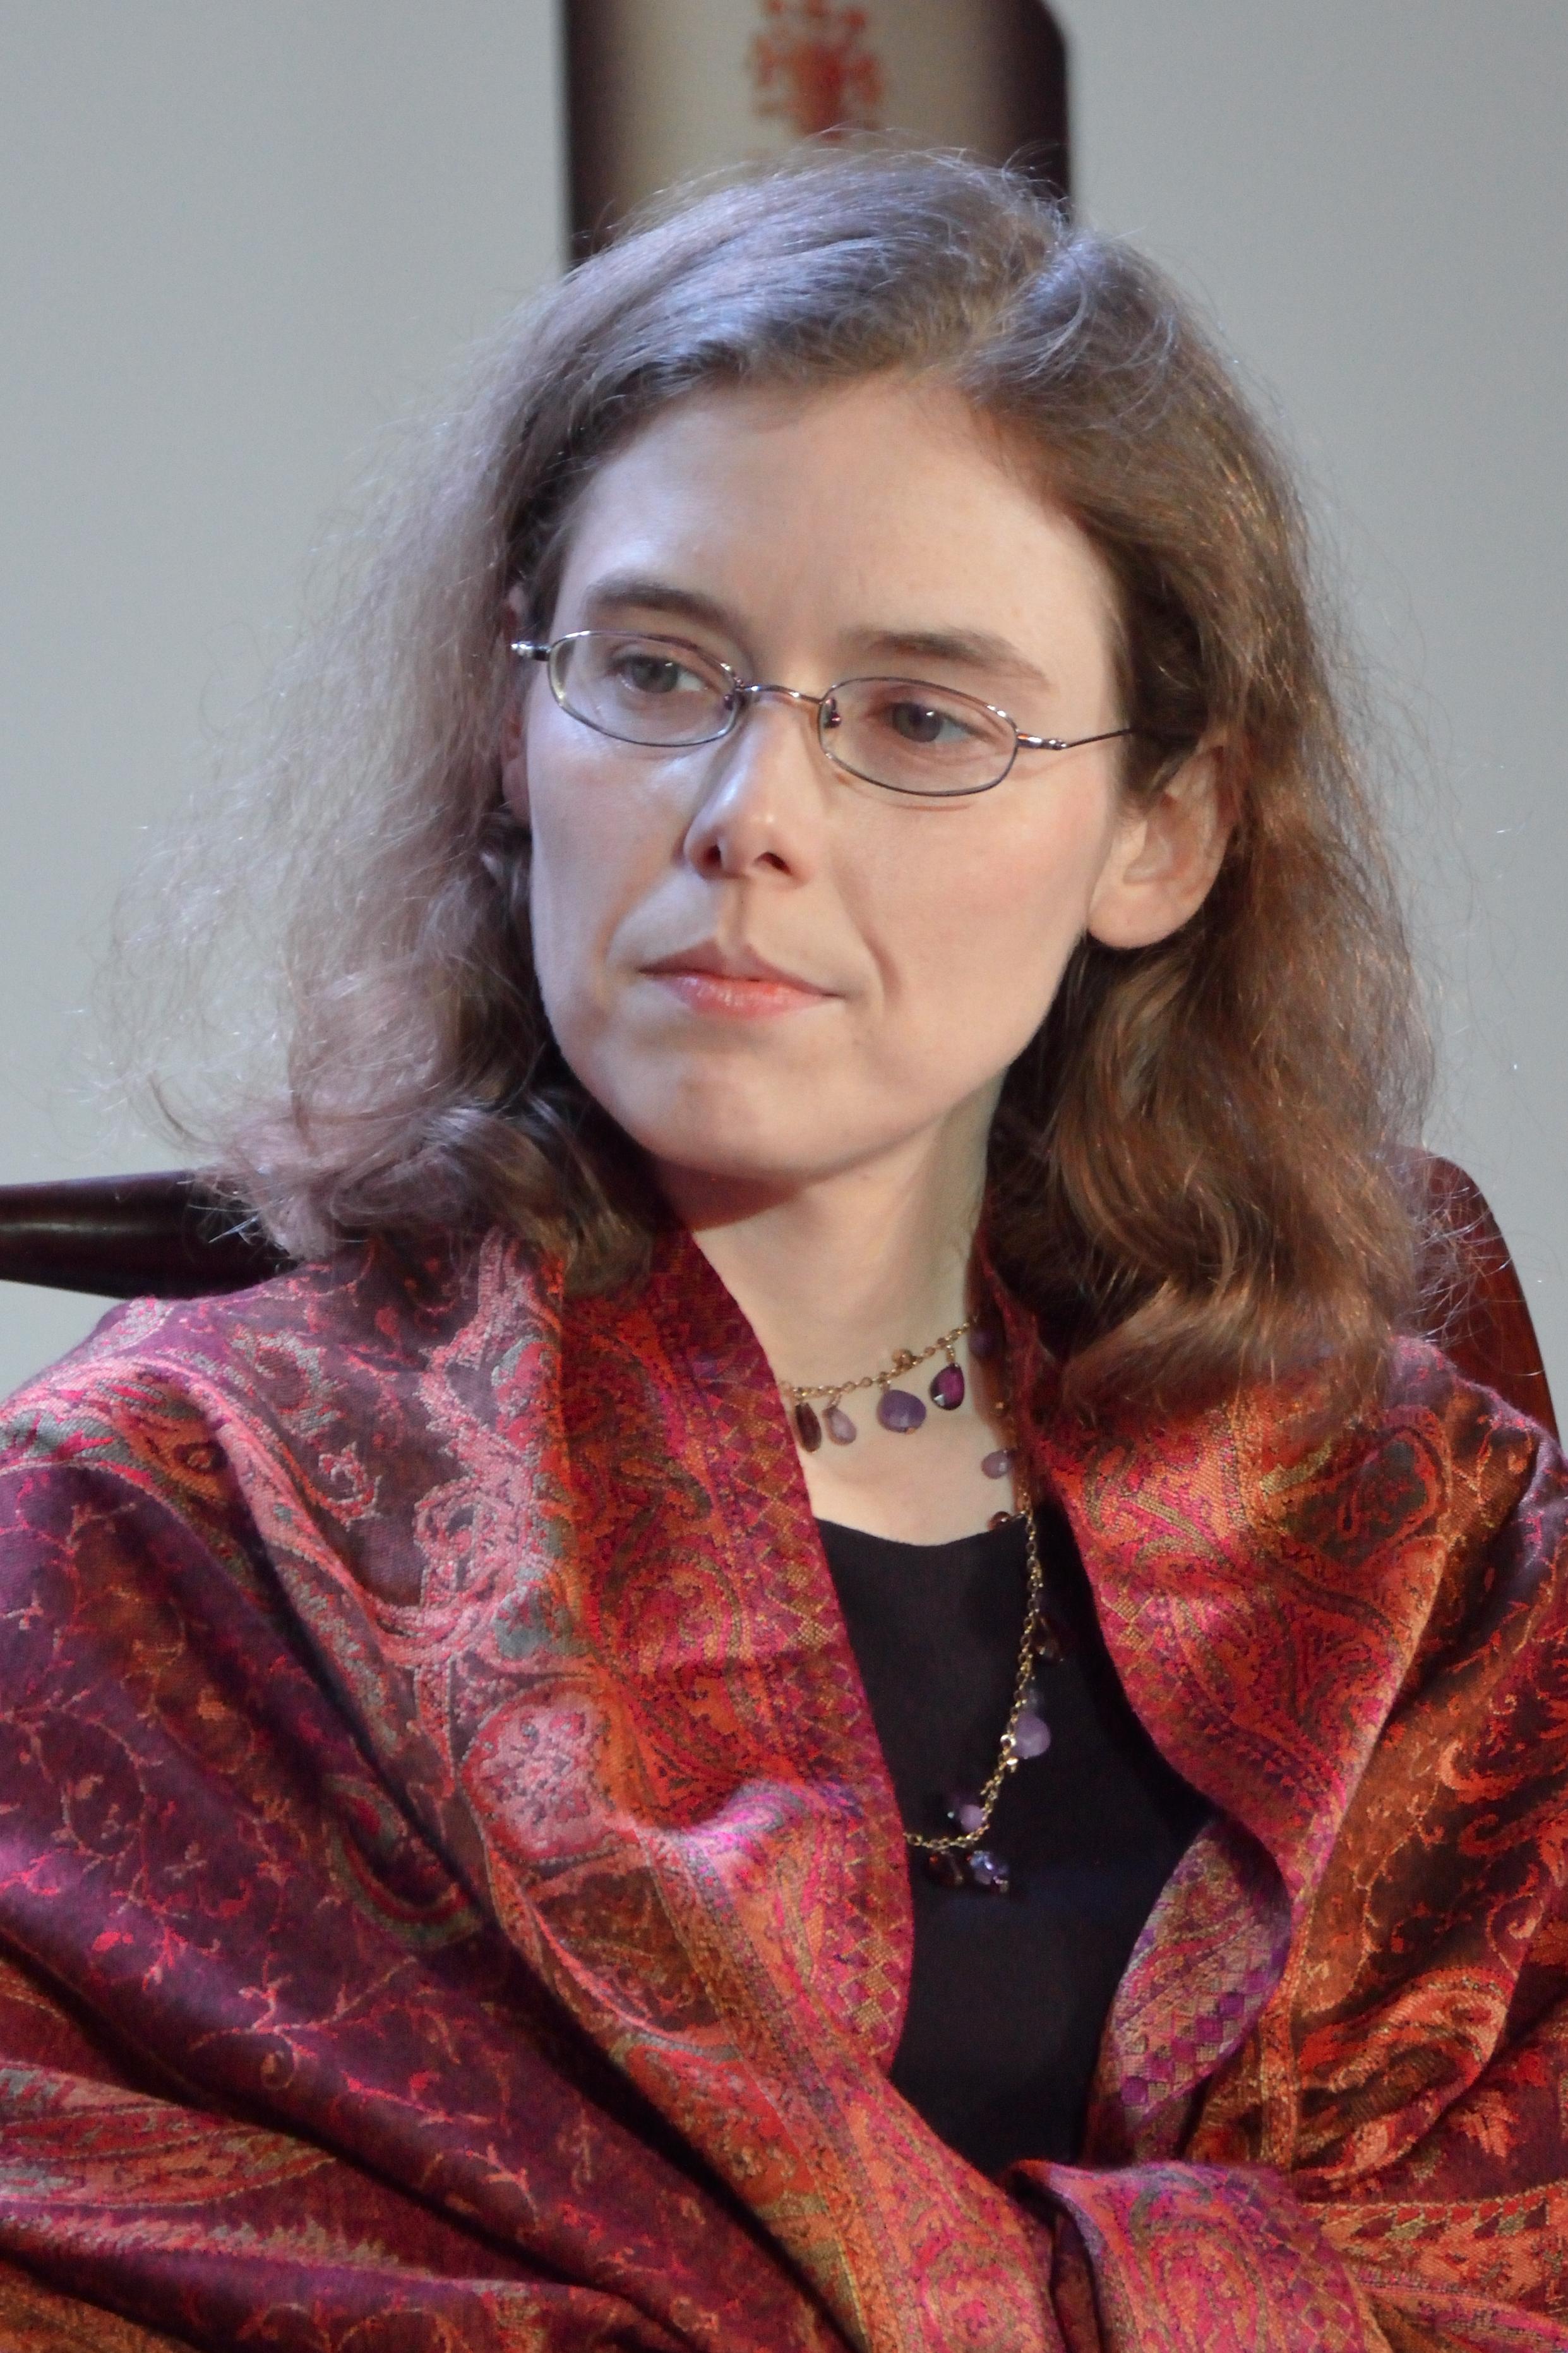 Miller in 2013